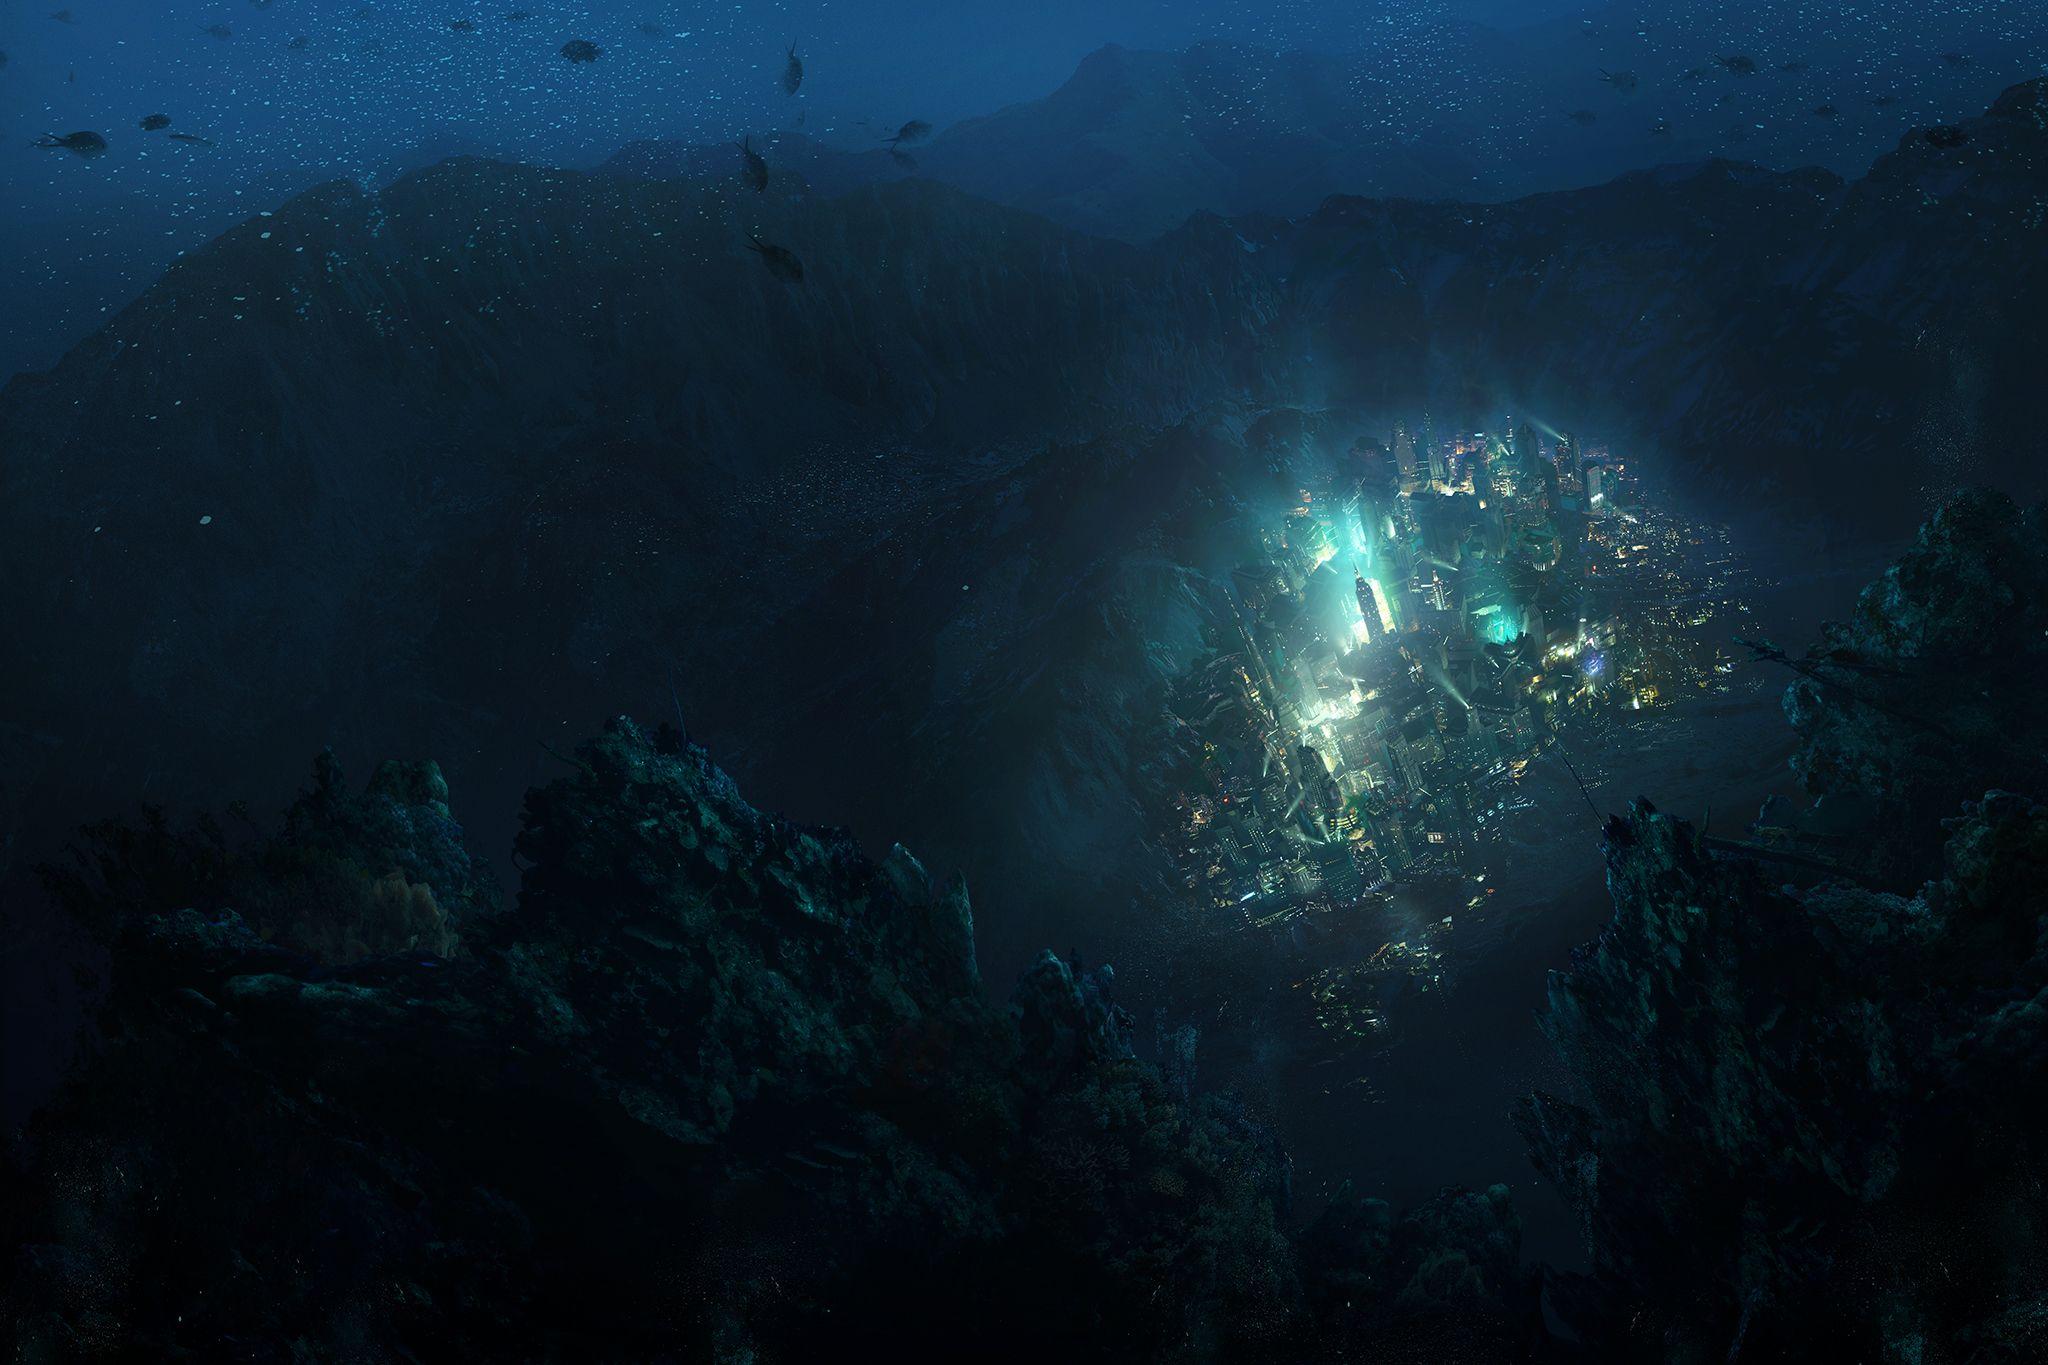 http://magazine.artstation.com/wp-content/uploads/2014/01/BioShock_S1_Final.jpg